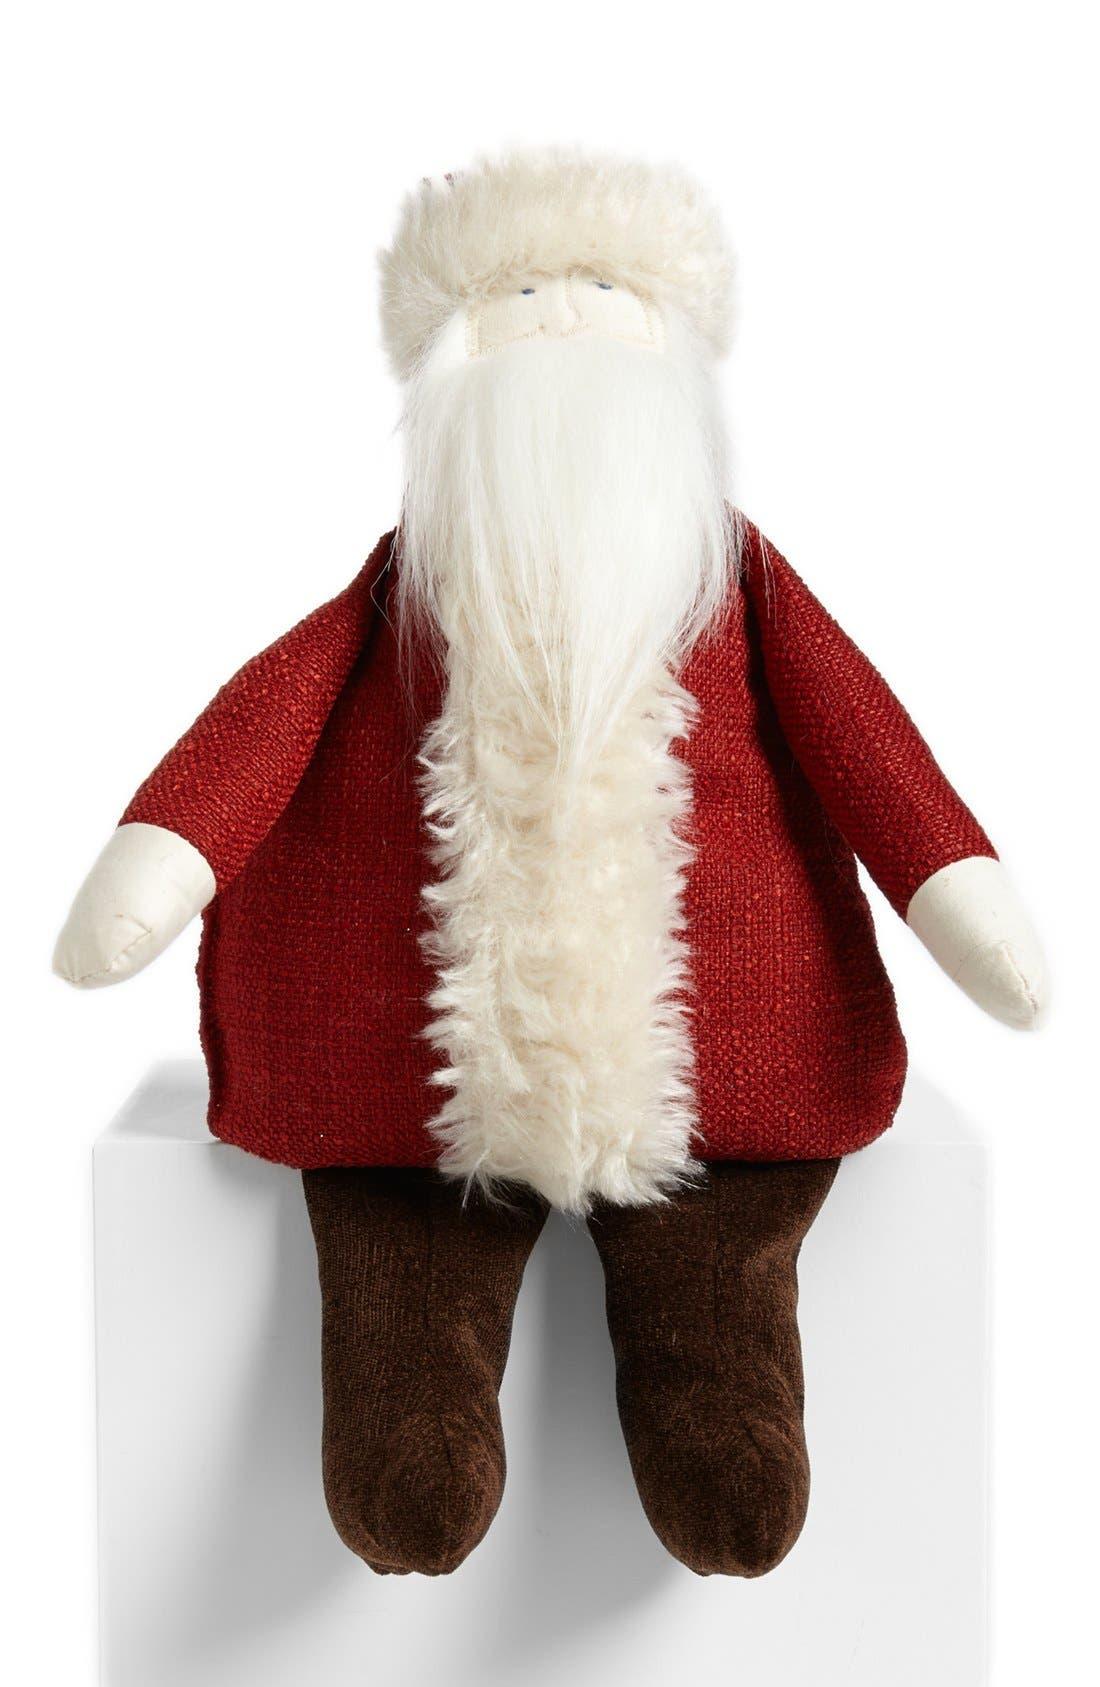 Main Image - Woof & Poof 'Santa - Small' Doll